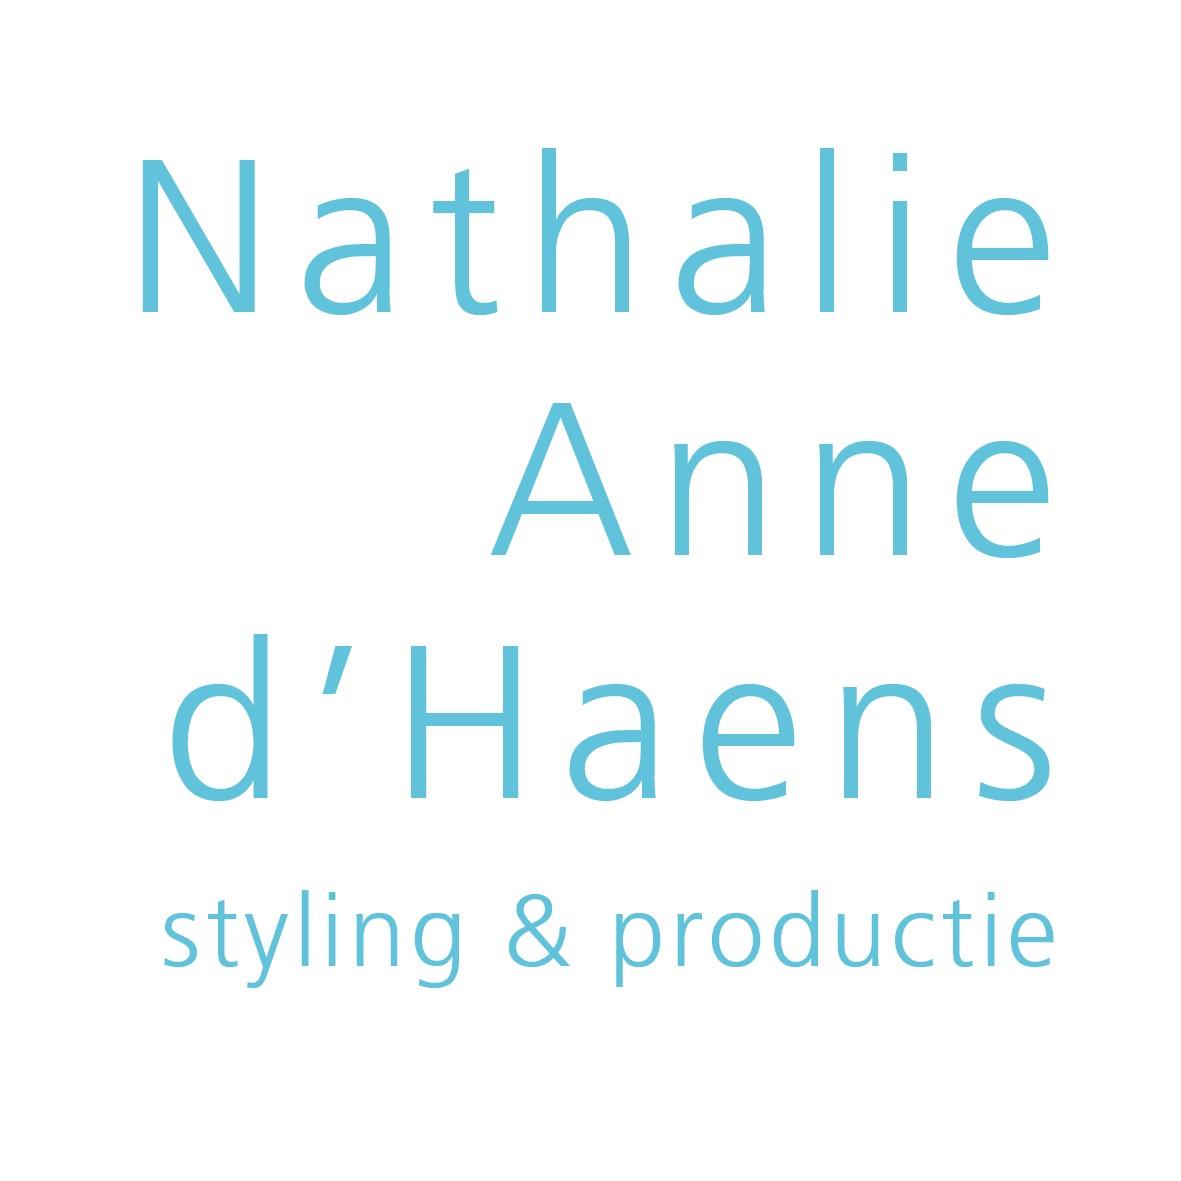 Nathalie Anne